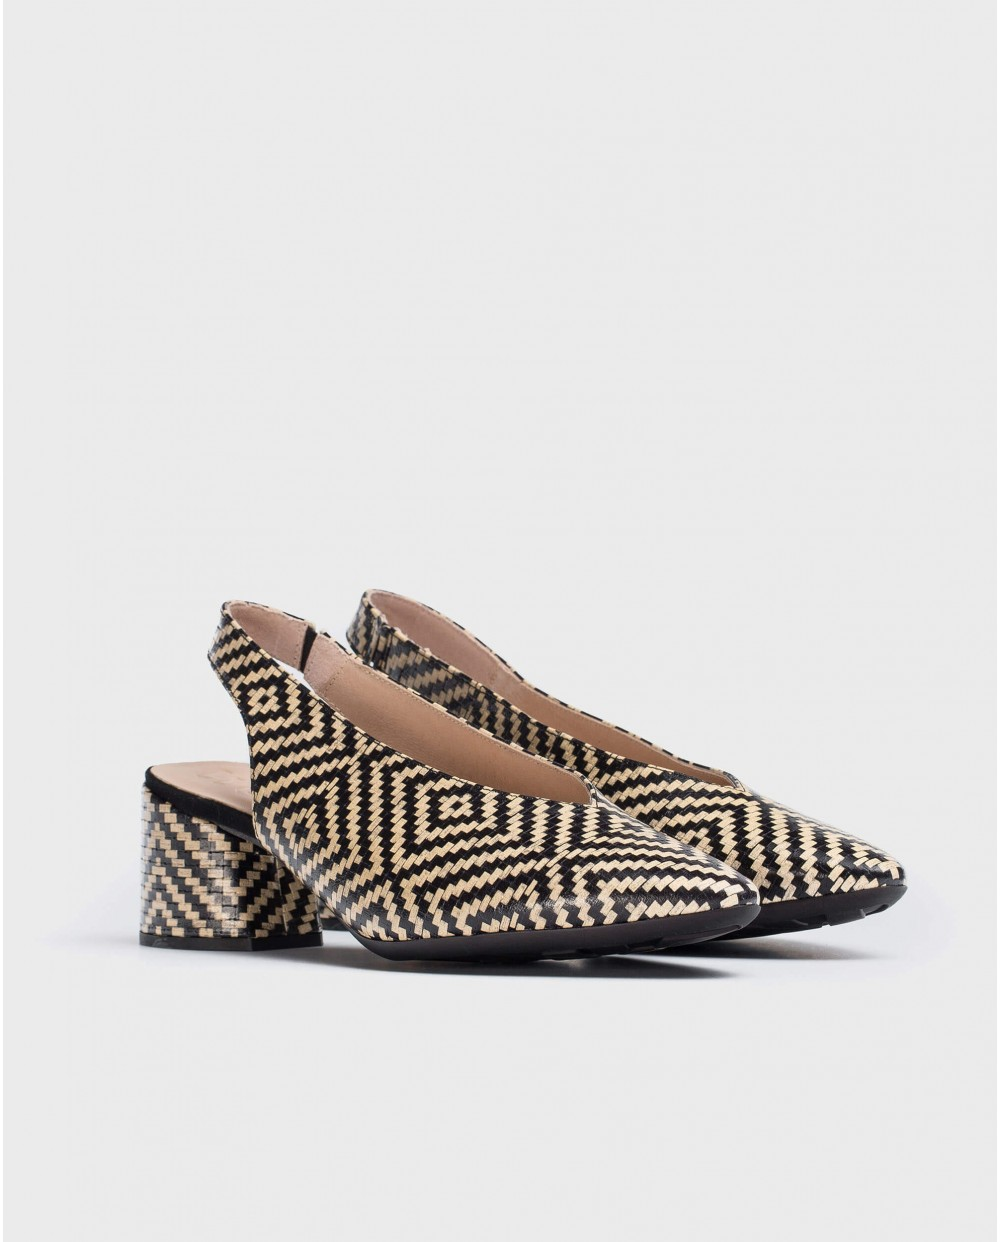 Wonders-Heels-High heeled braided leather shoe